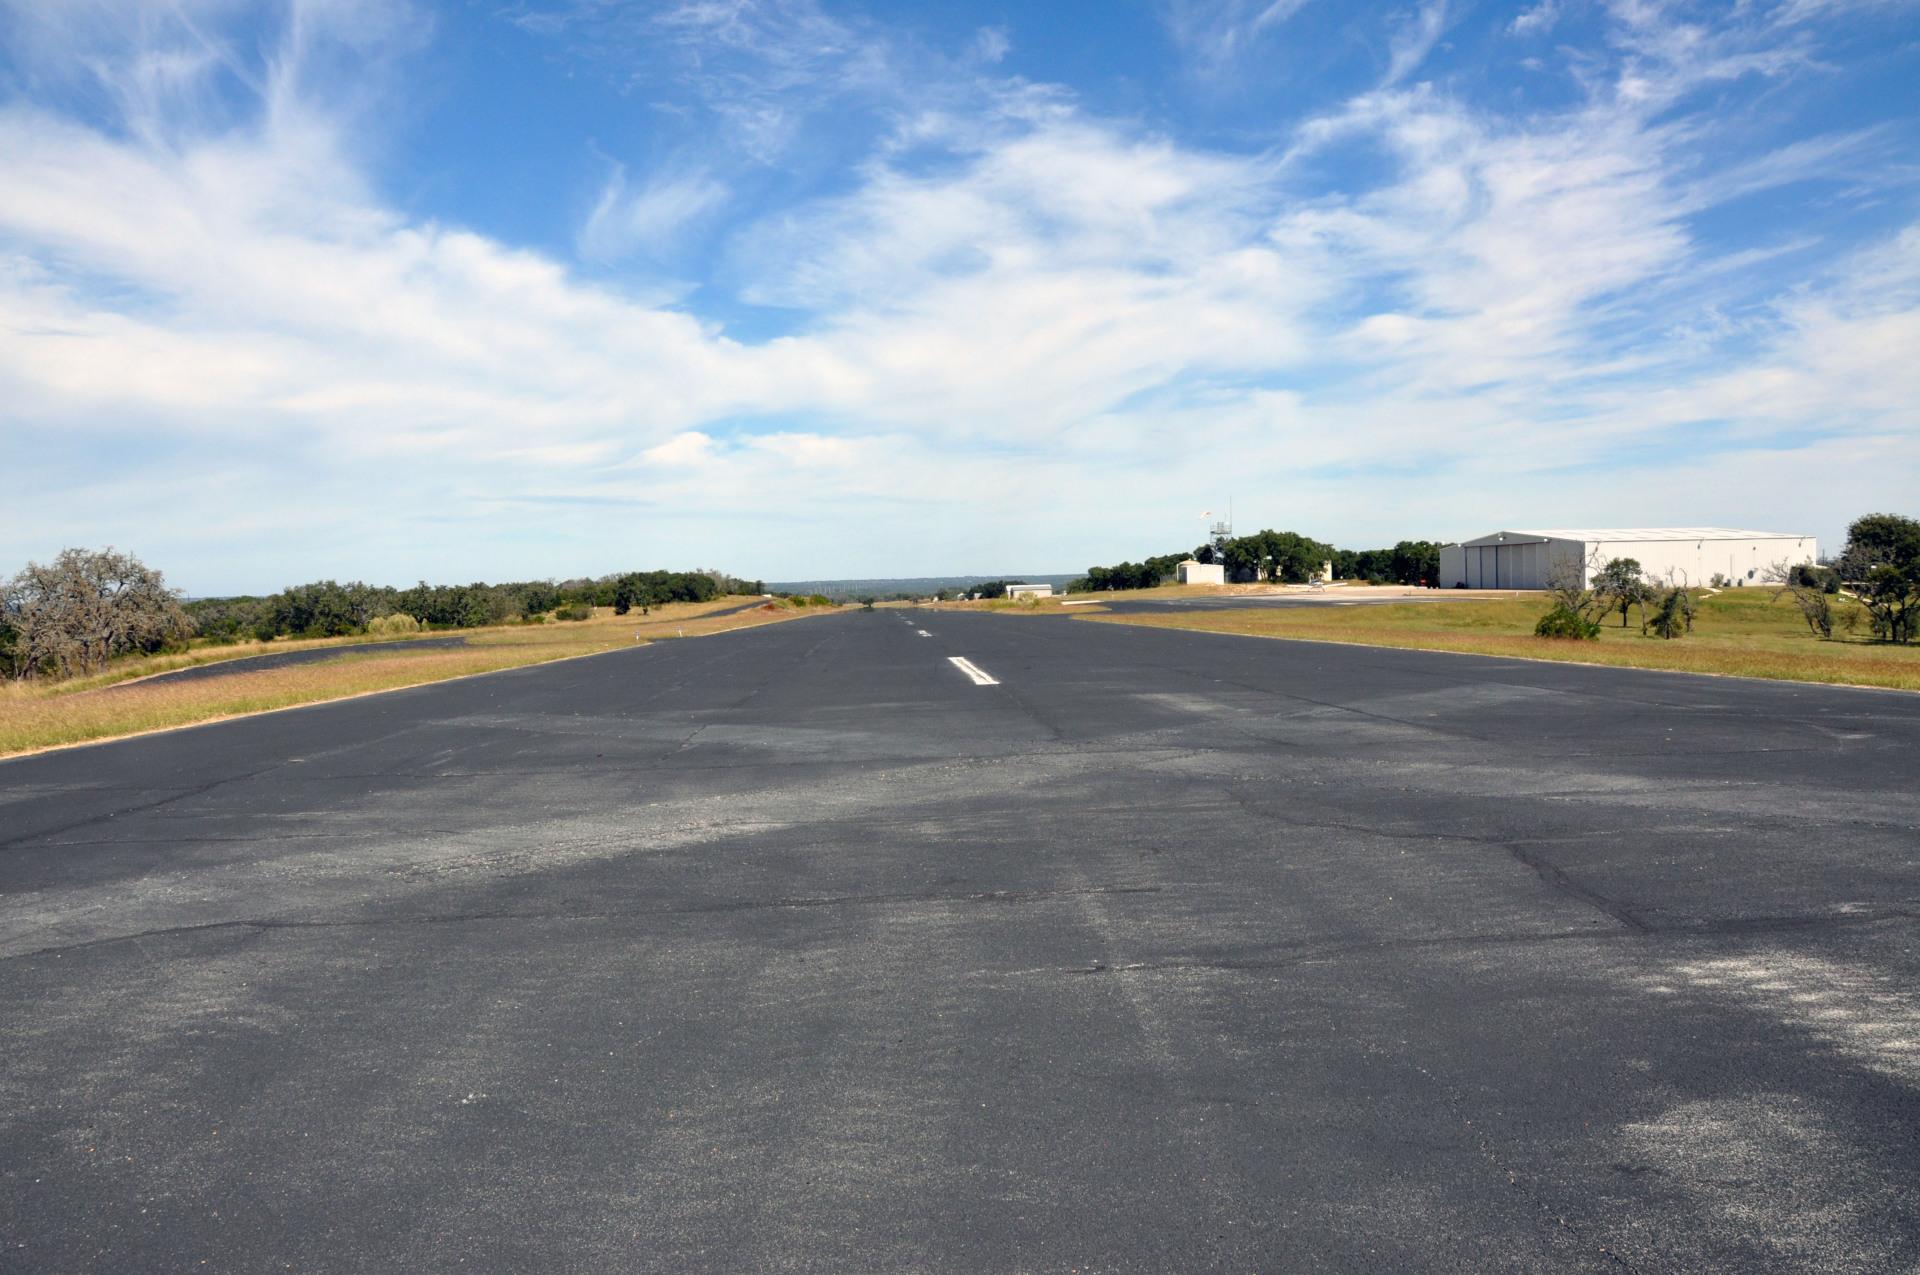 Paved asphalt runway